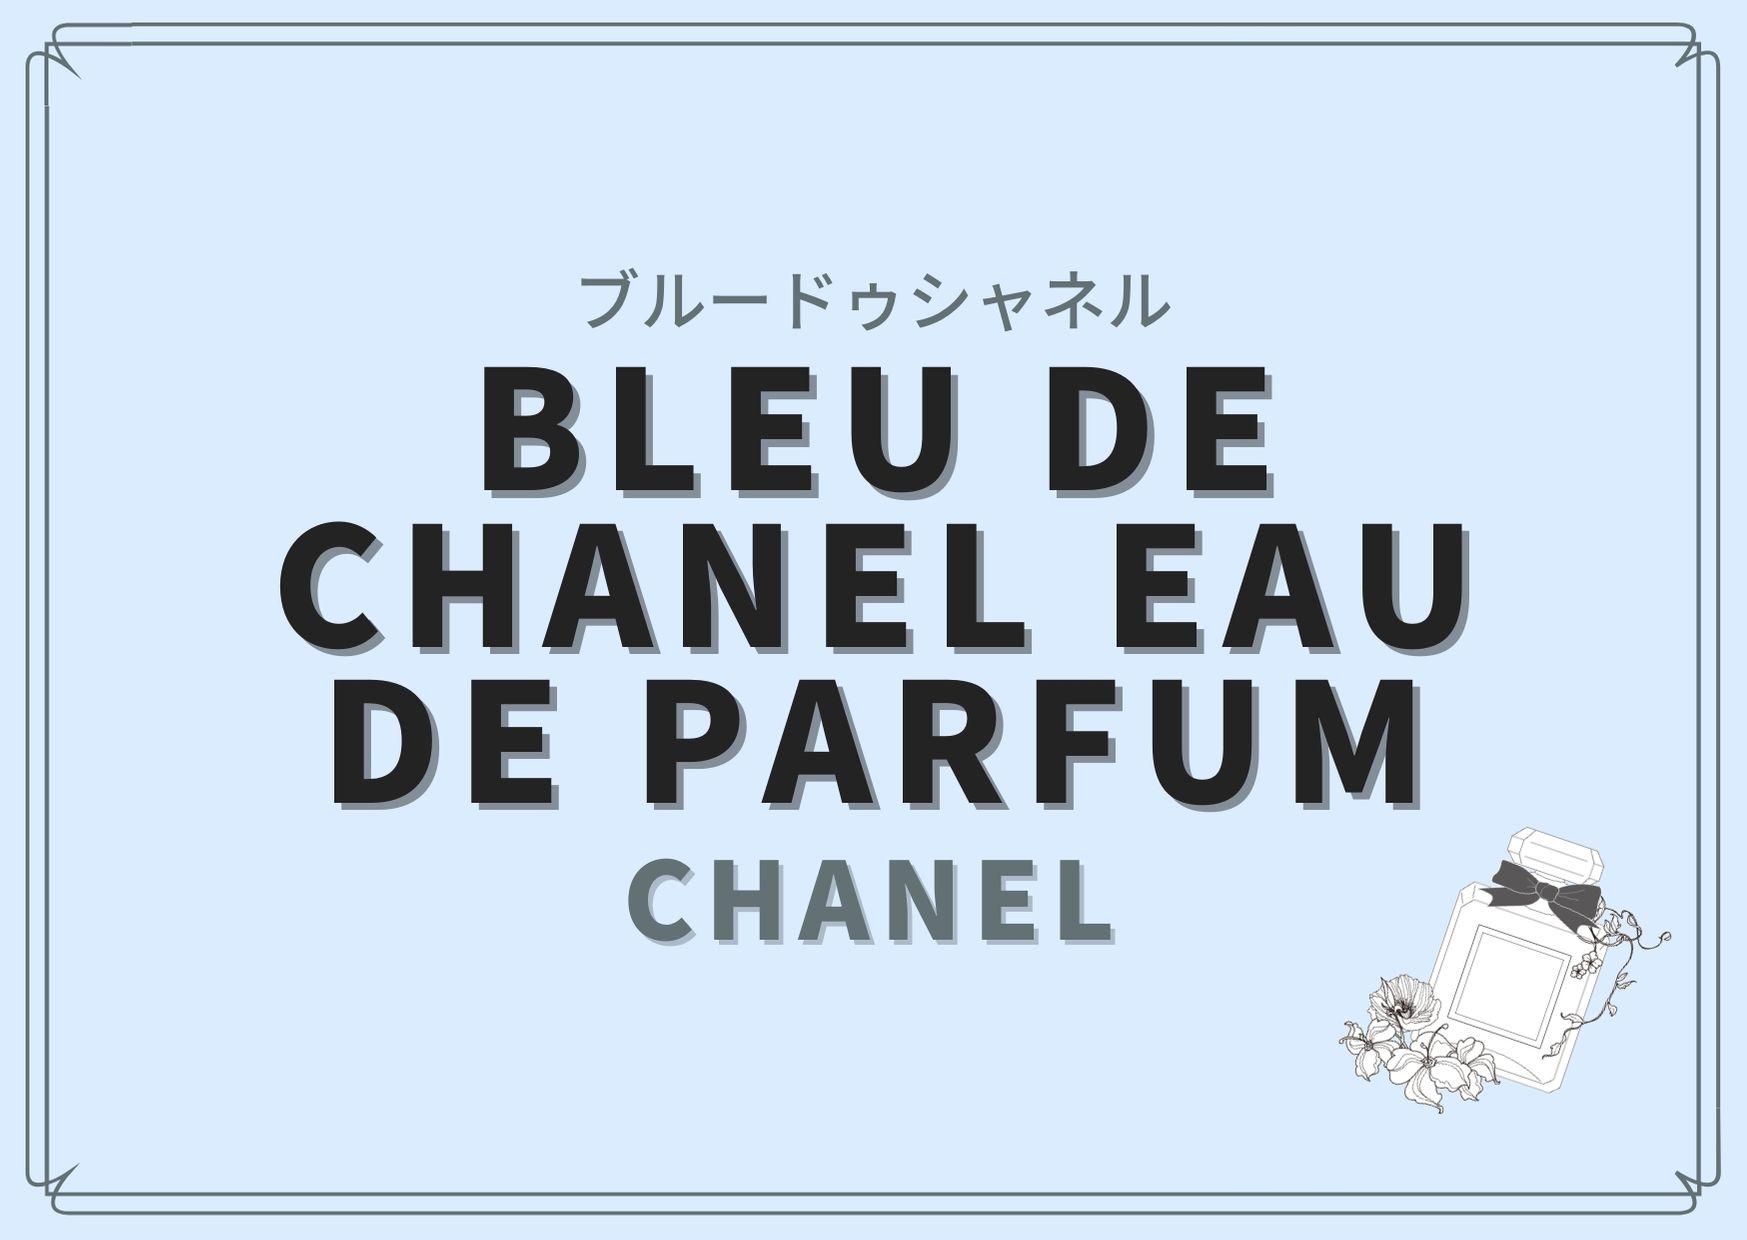 Bleu de Chanel Eau de parfum(ブルードゥシャネル)/CHANEL(シャネル)